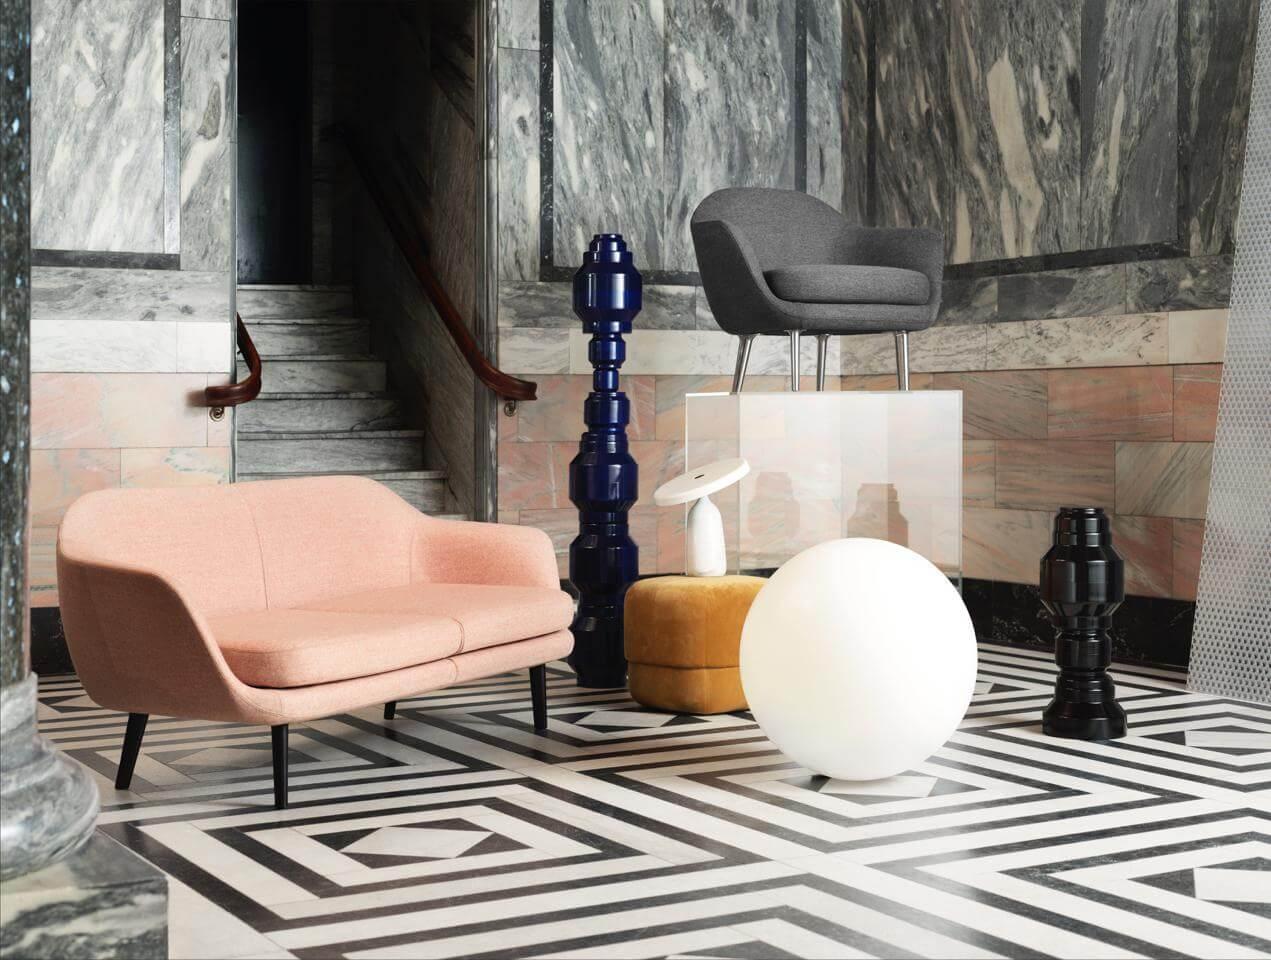 Salone Del Mobile 2018 Das Sind Die Trends Deco Home